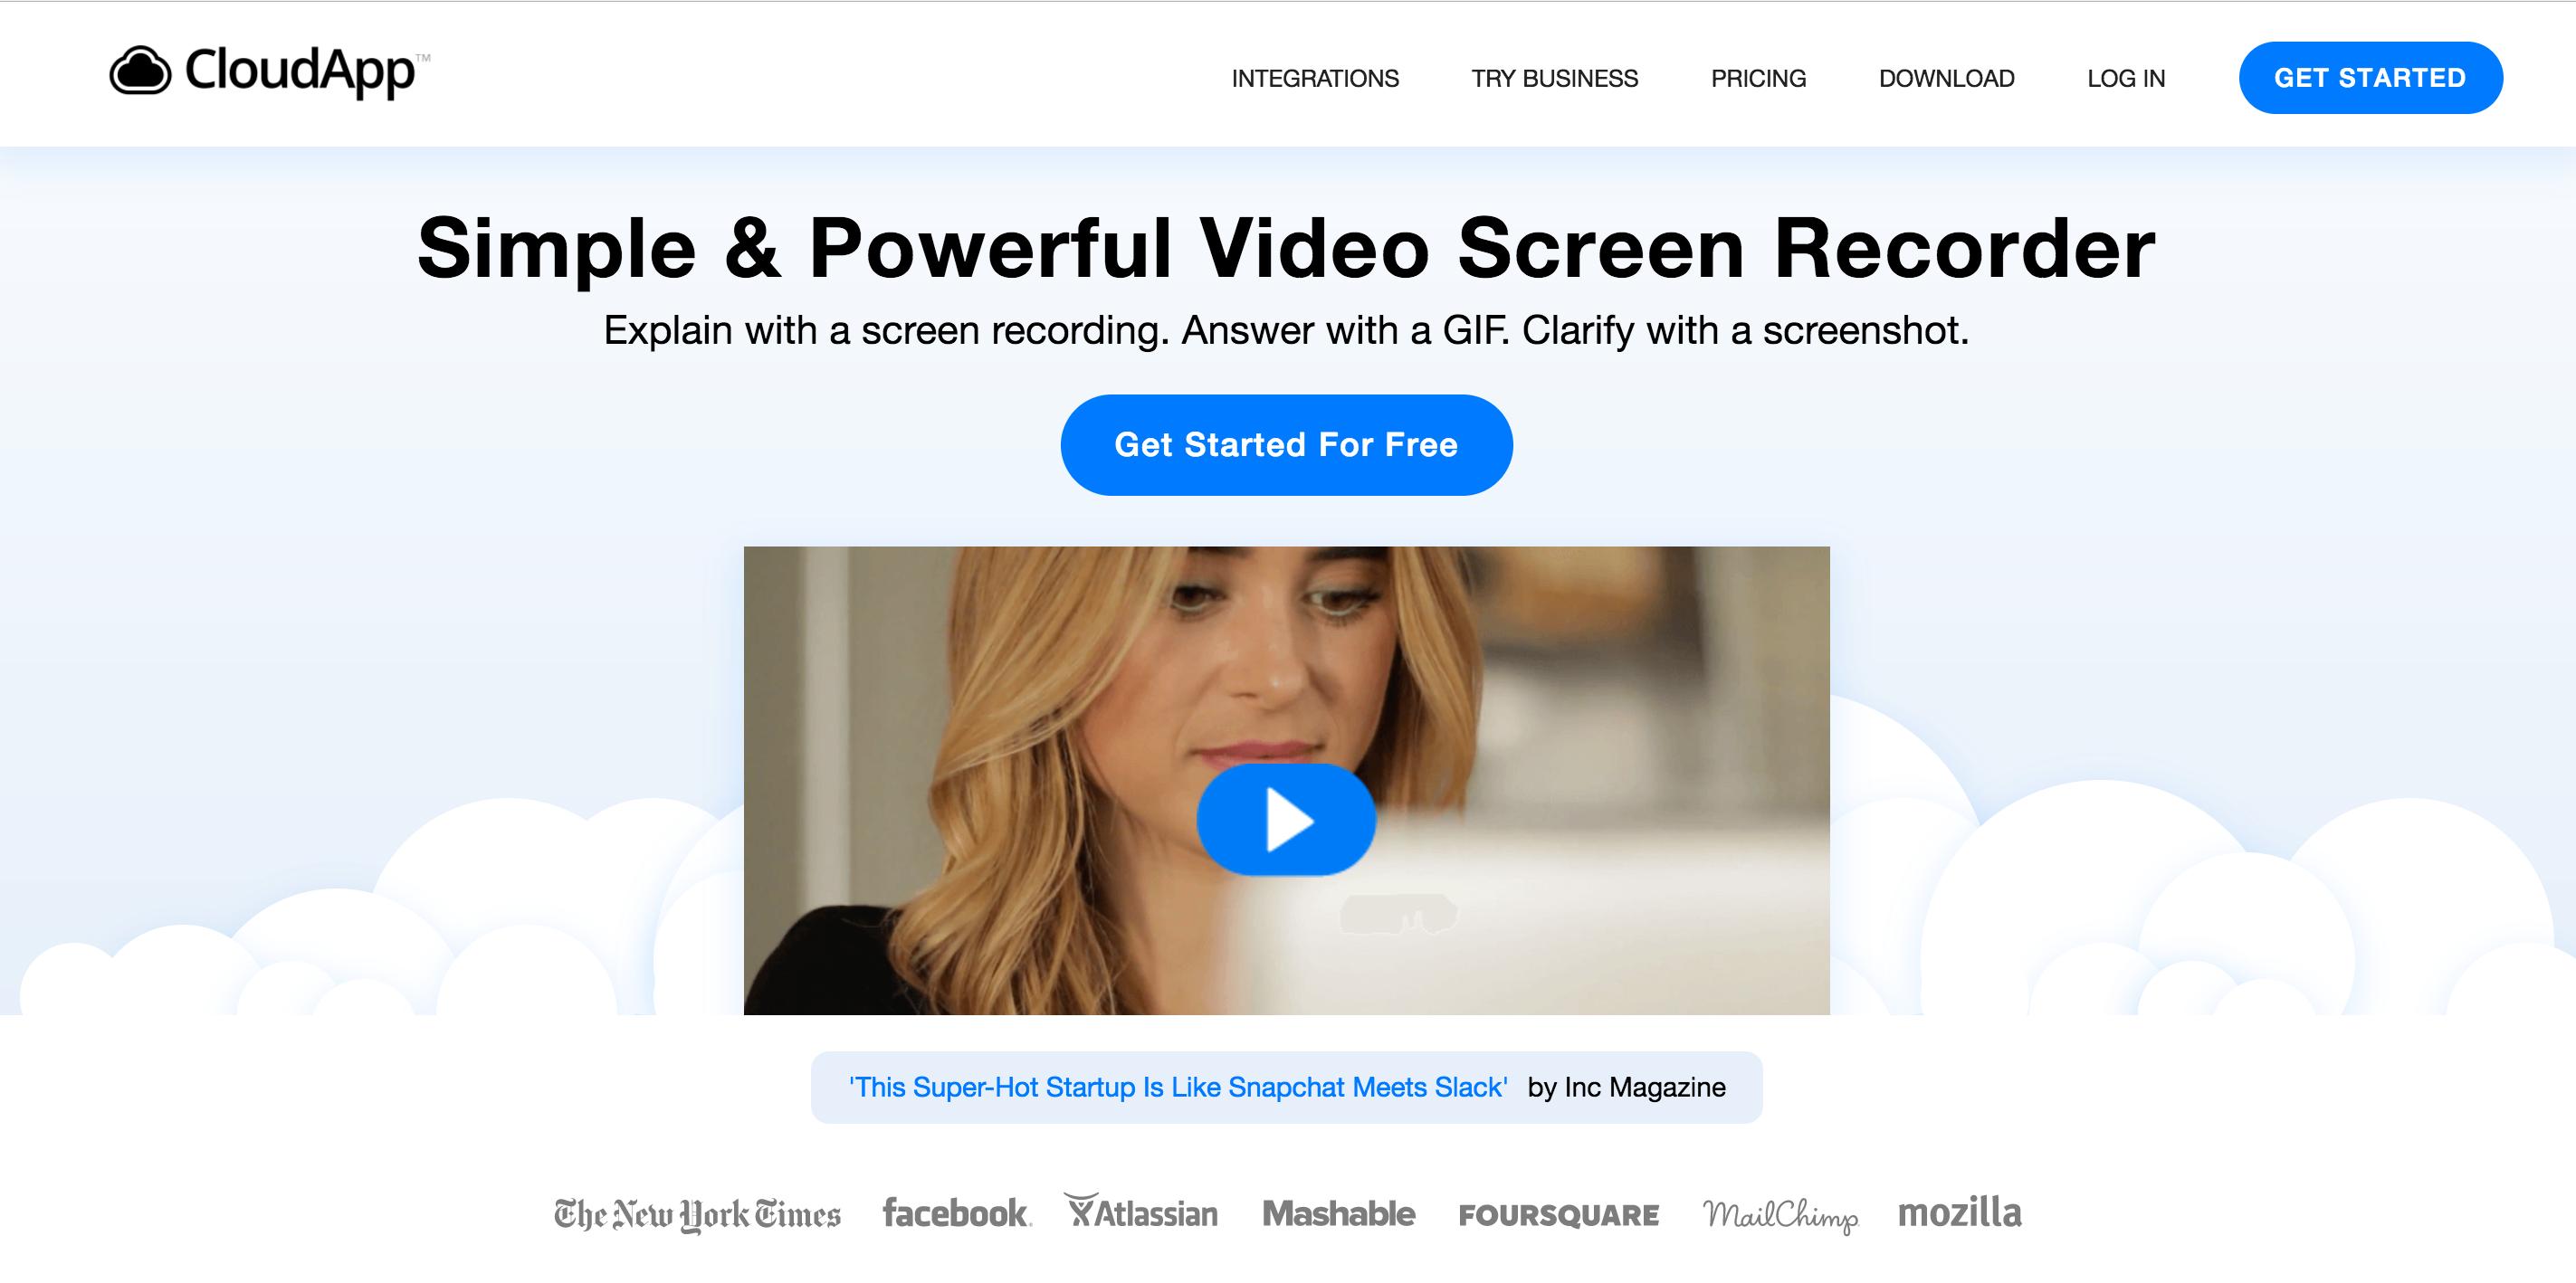 CloudApp Quickly create & share screen recordings, GIFs